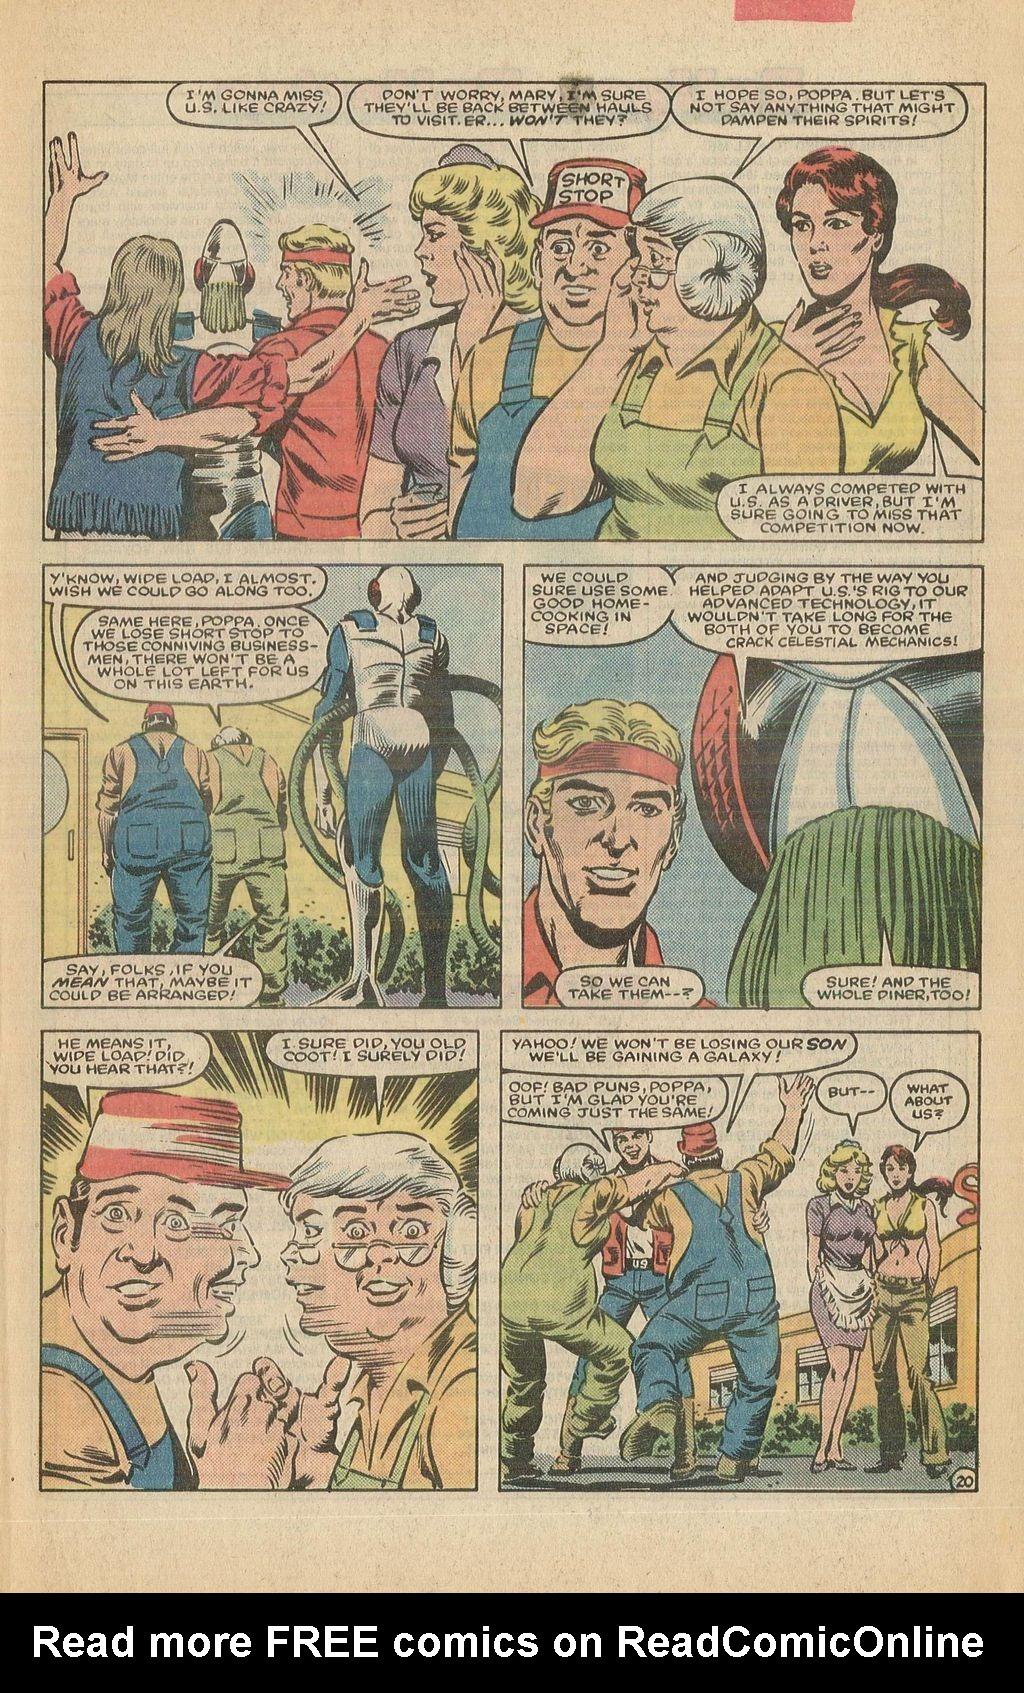 Read online U.S. 1 comic -  Issue #12 - 29